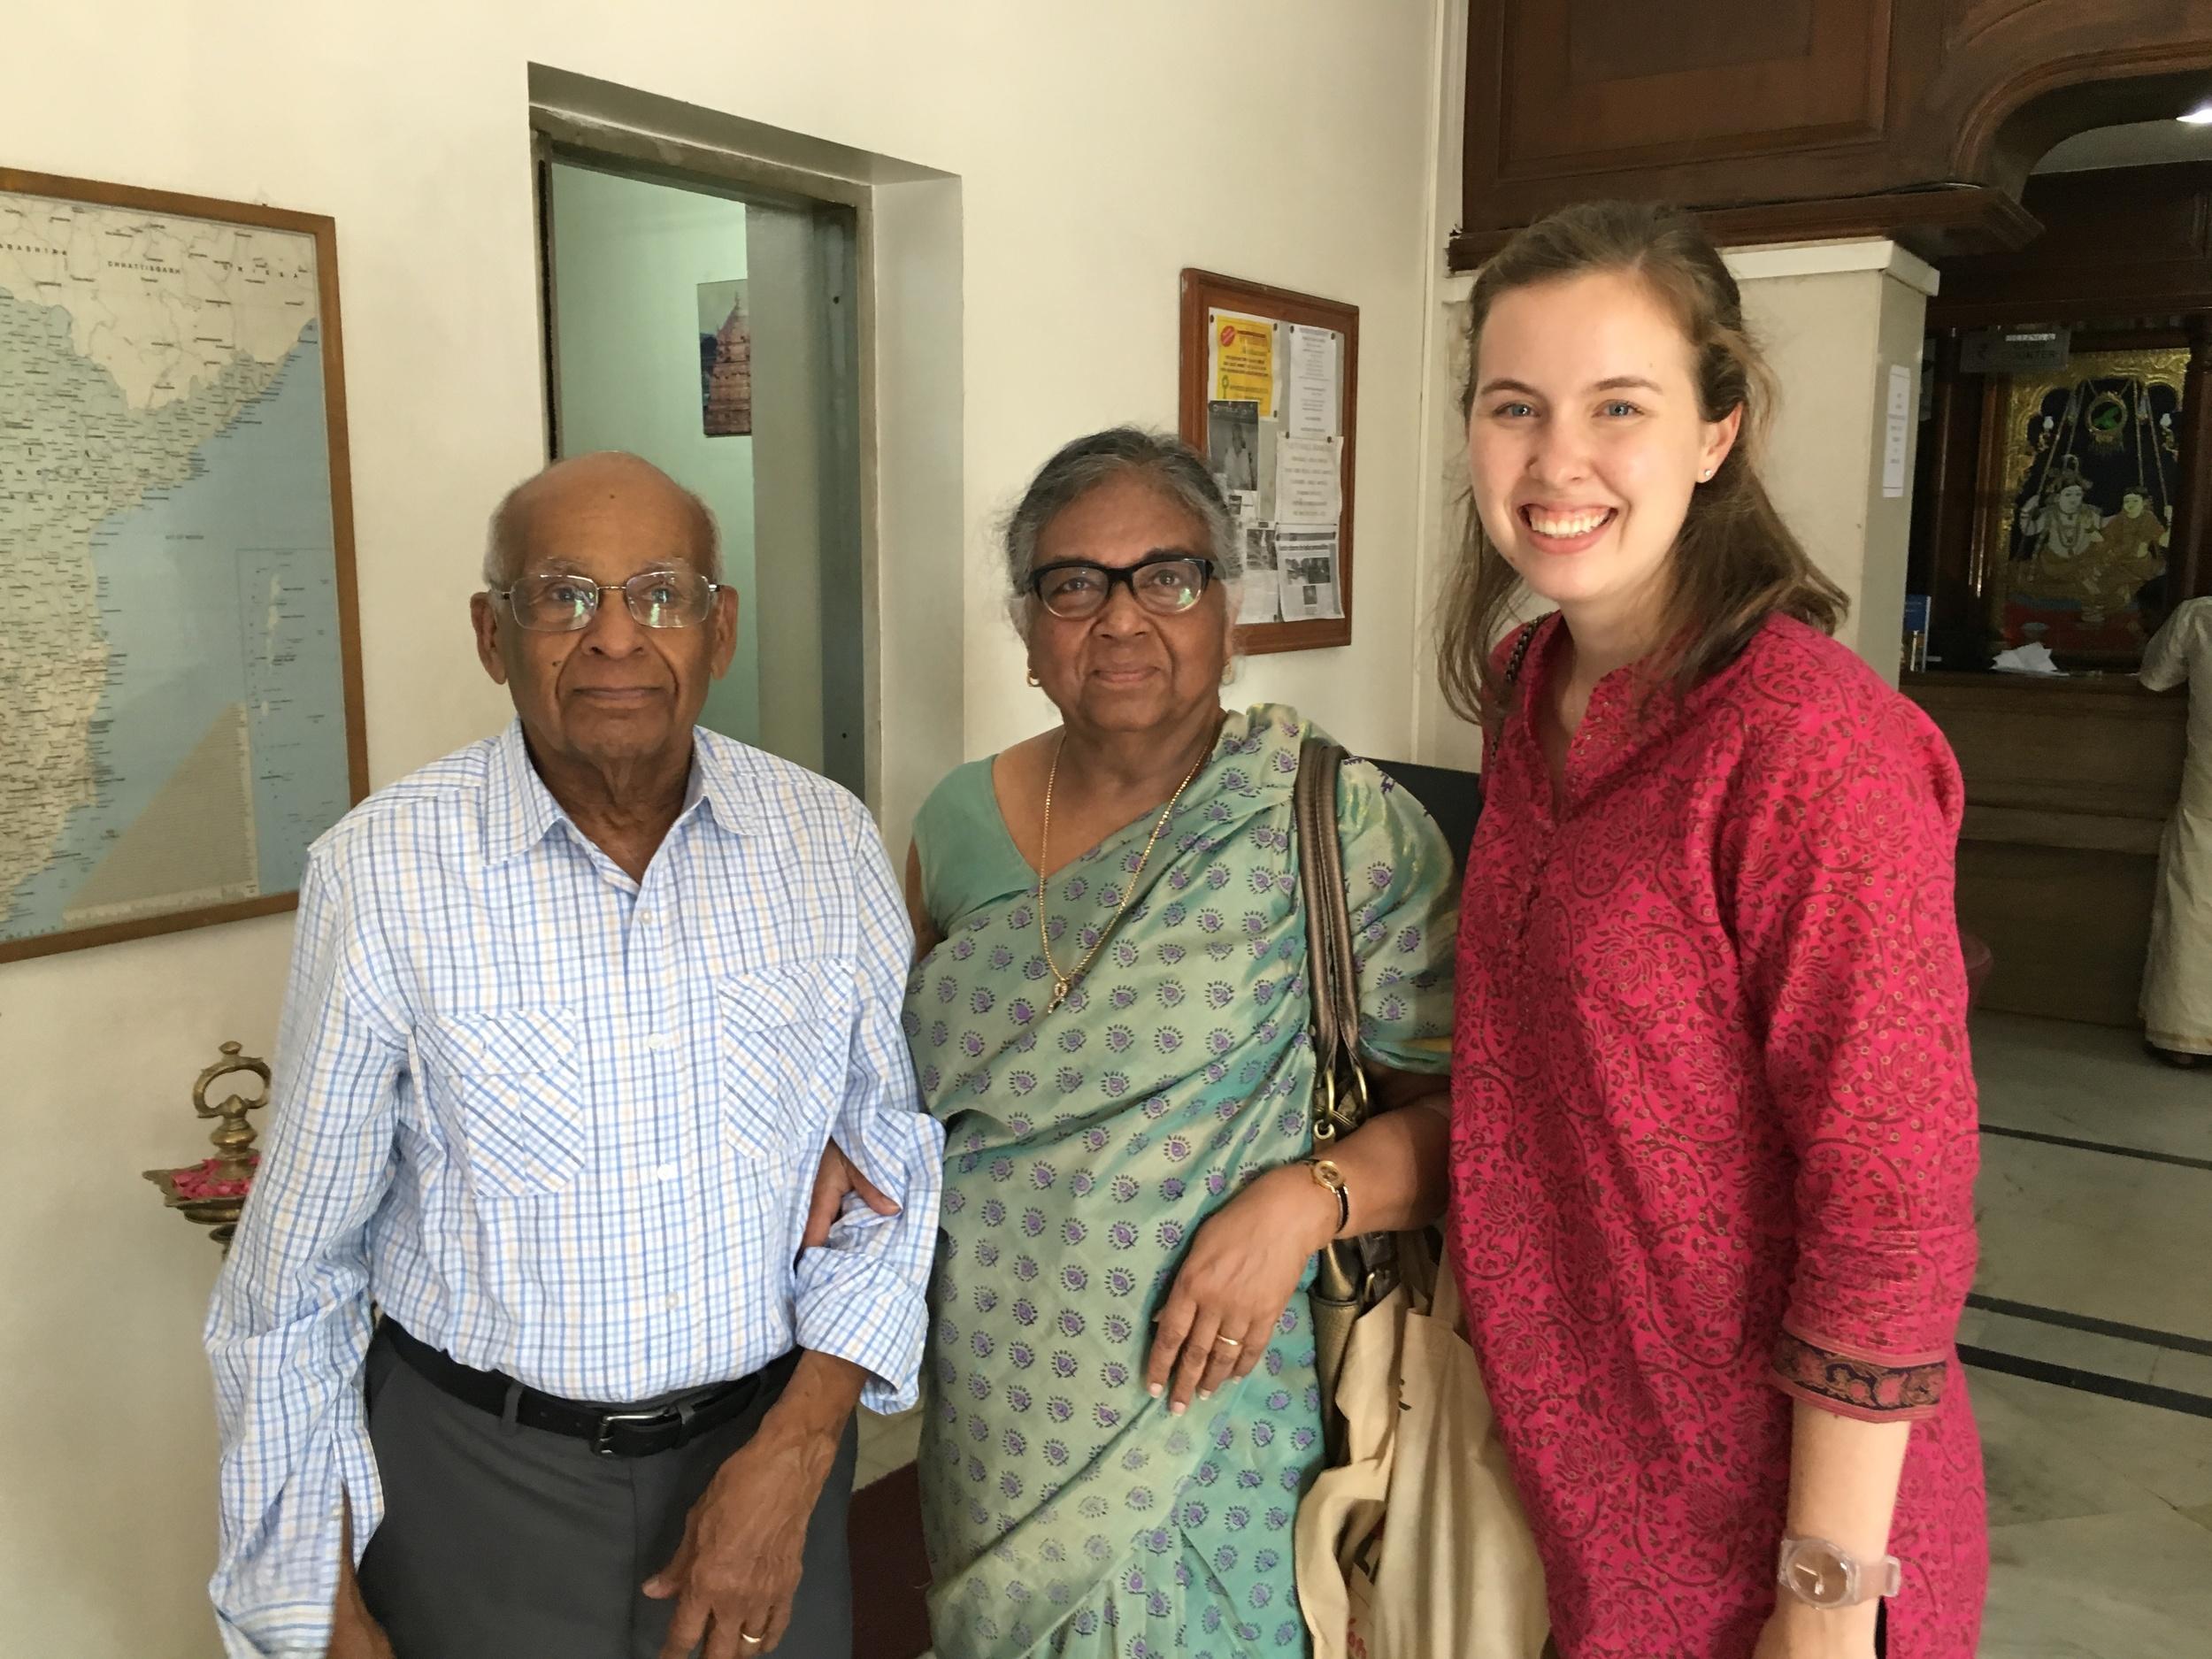 Adventuring to Chennai to meet family friends from NJ, Gus and Neela Pushparaj.